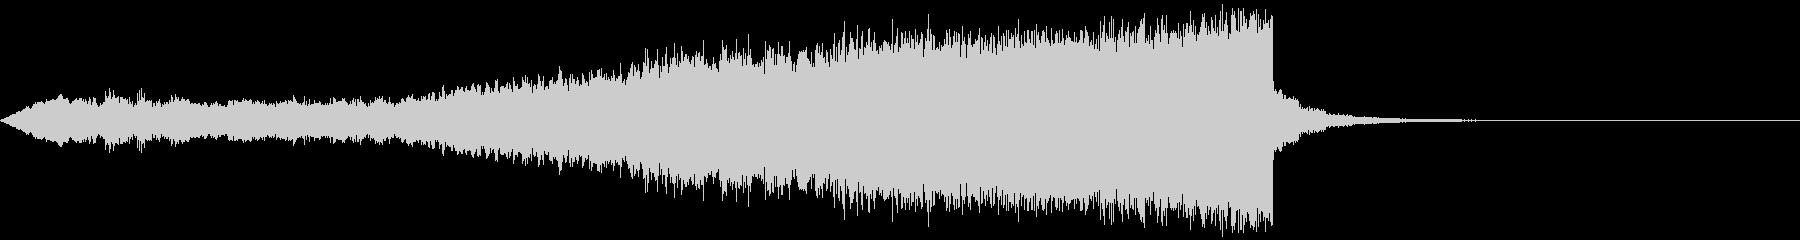 CINEMATIC RISER_46の未再生の波形